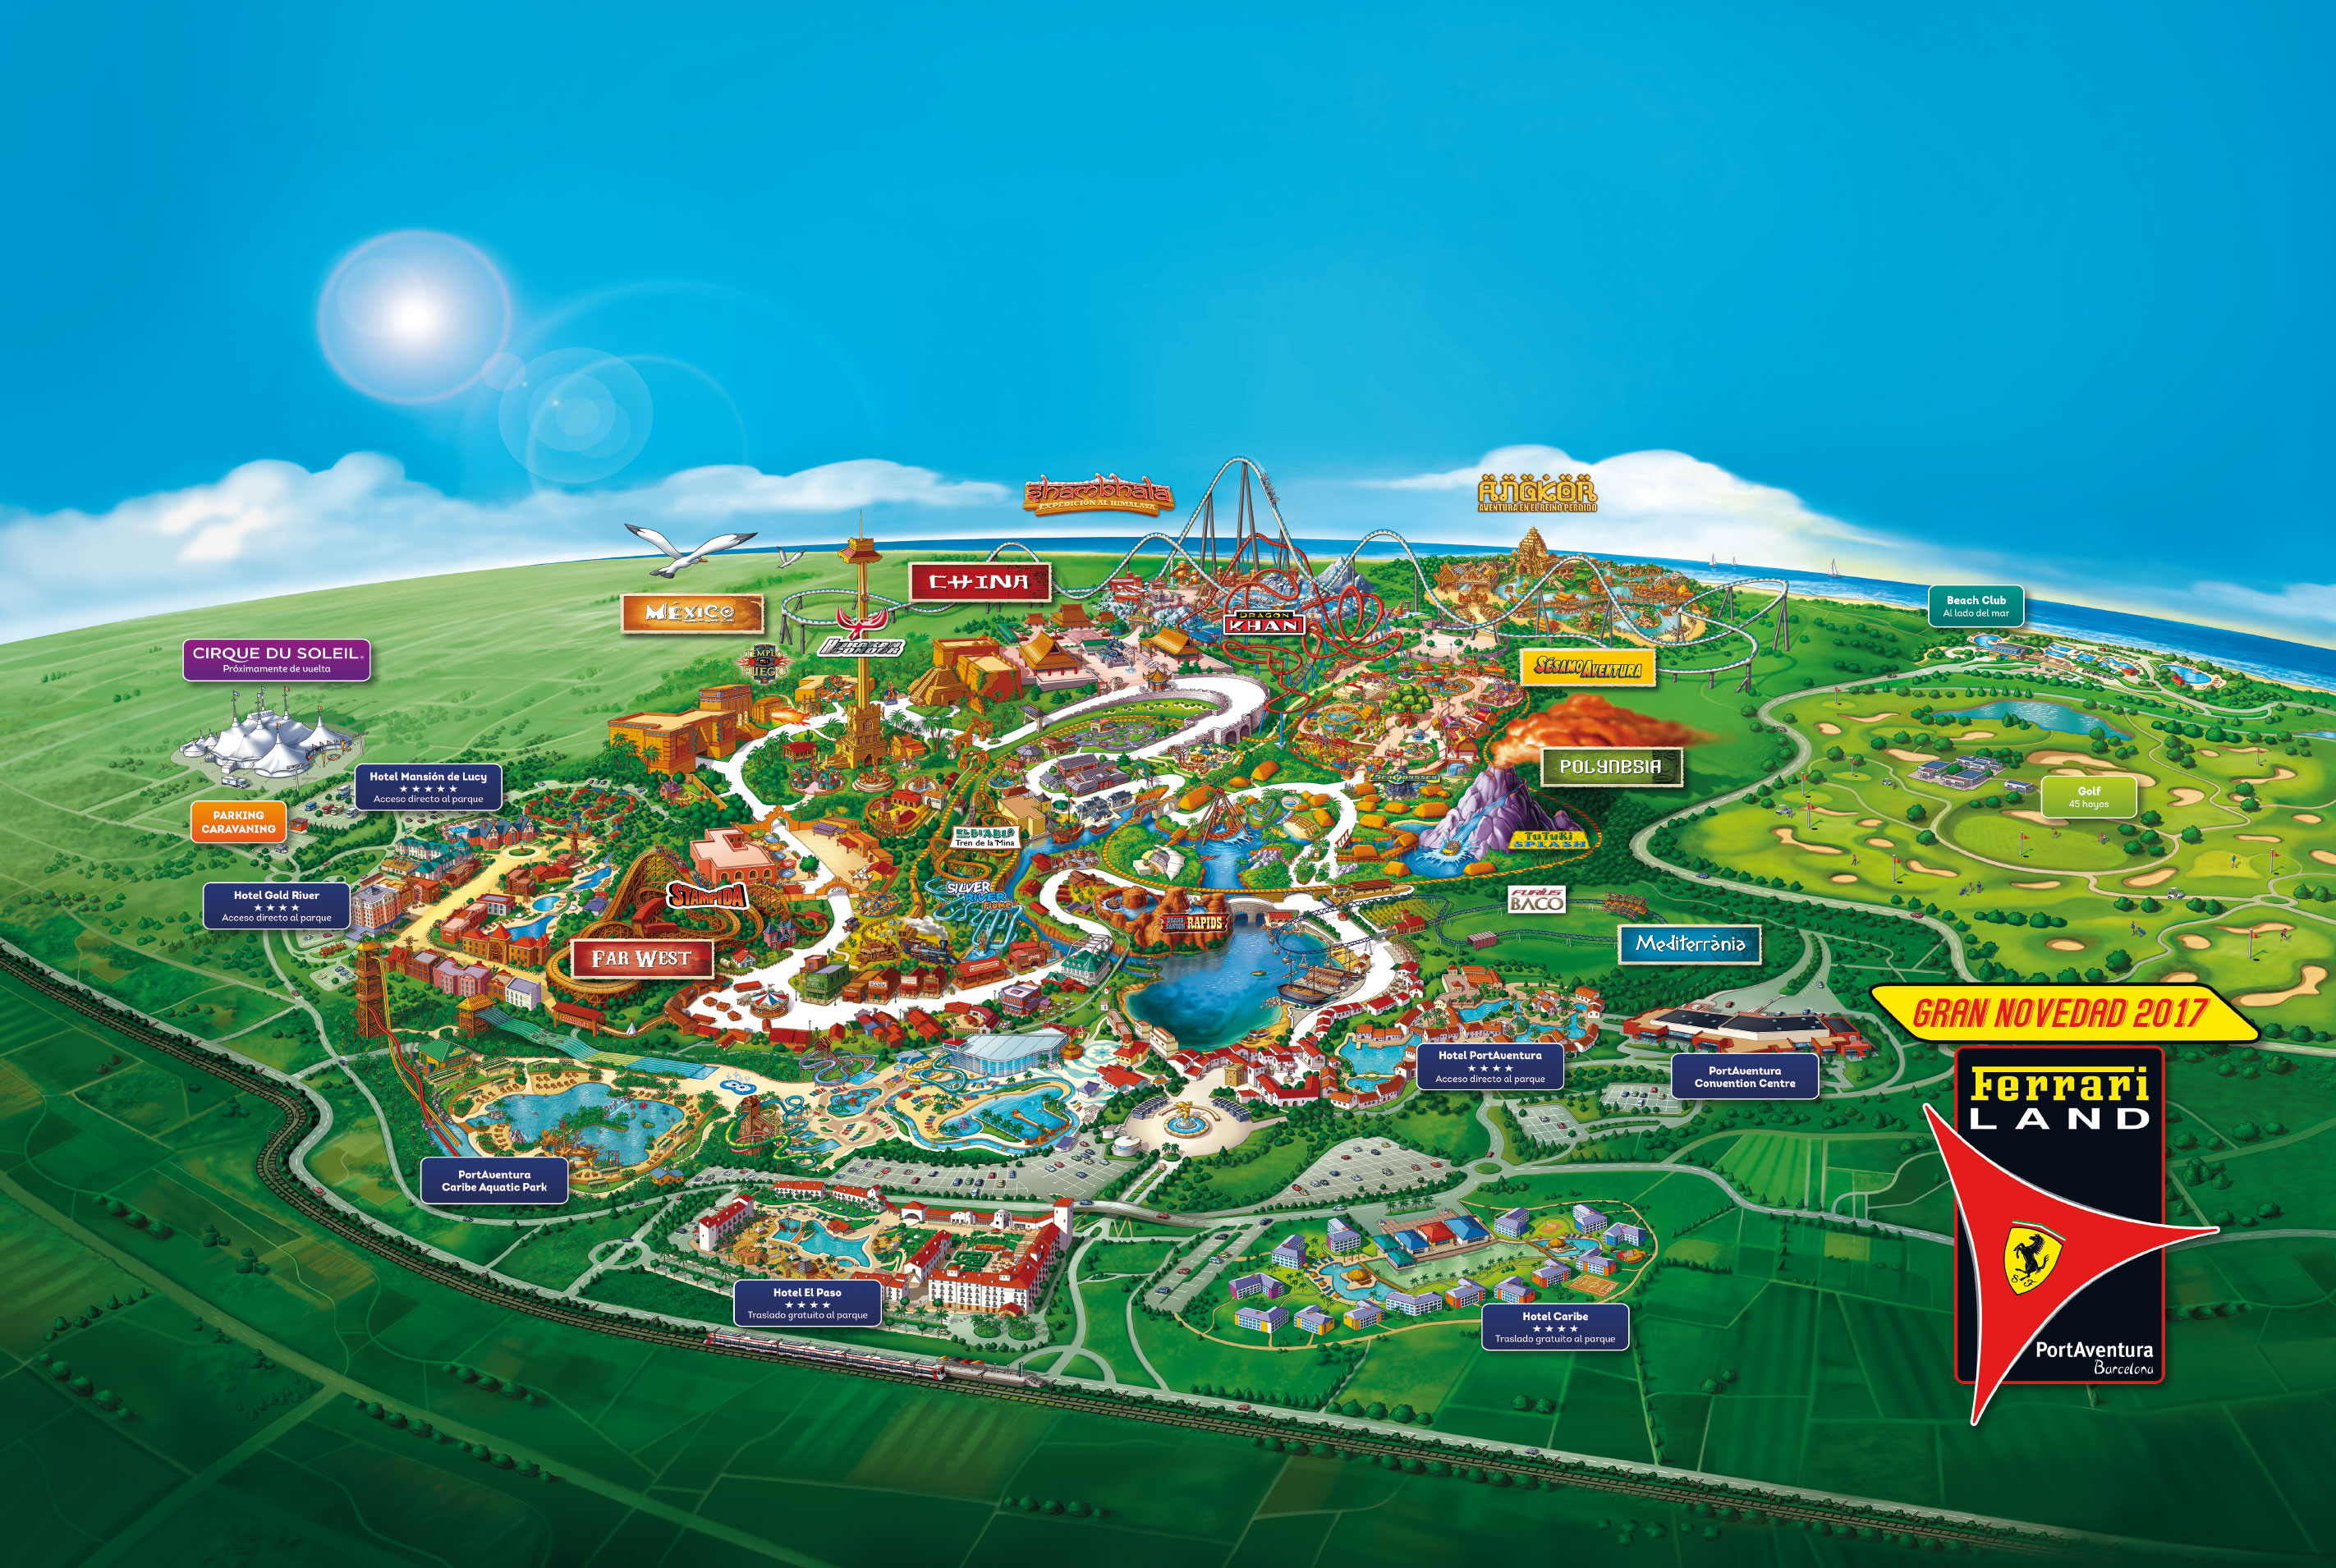 Portaventura World Salou Monkey Park Iwatayama